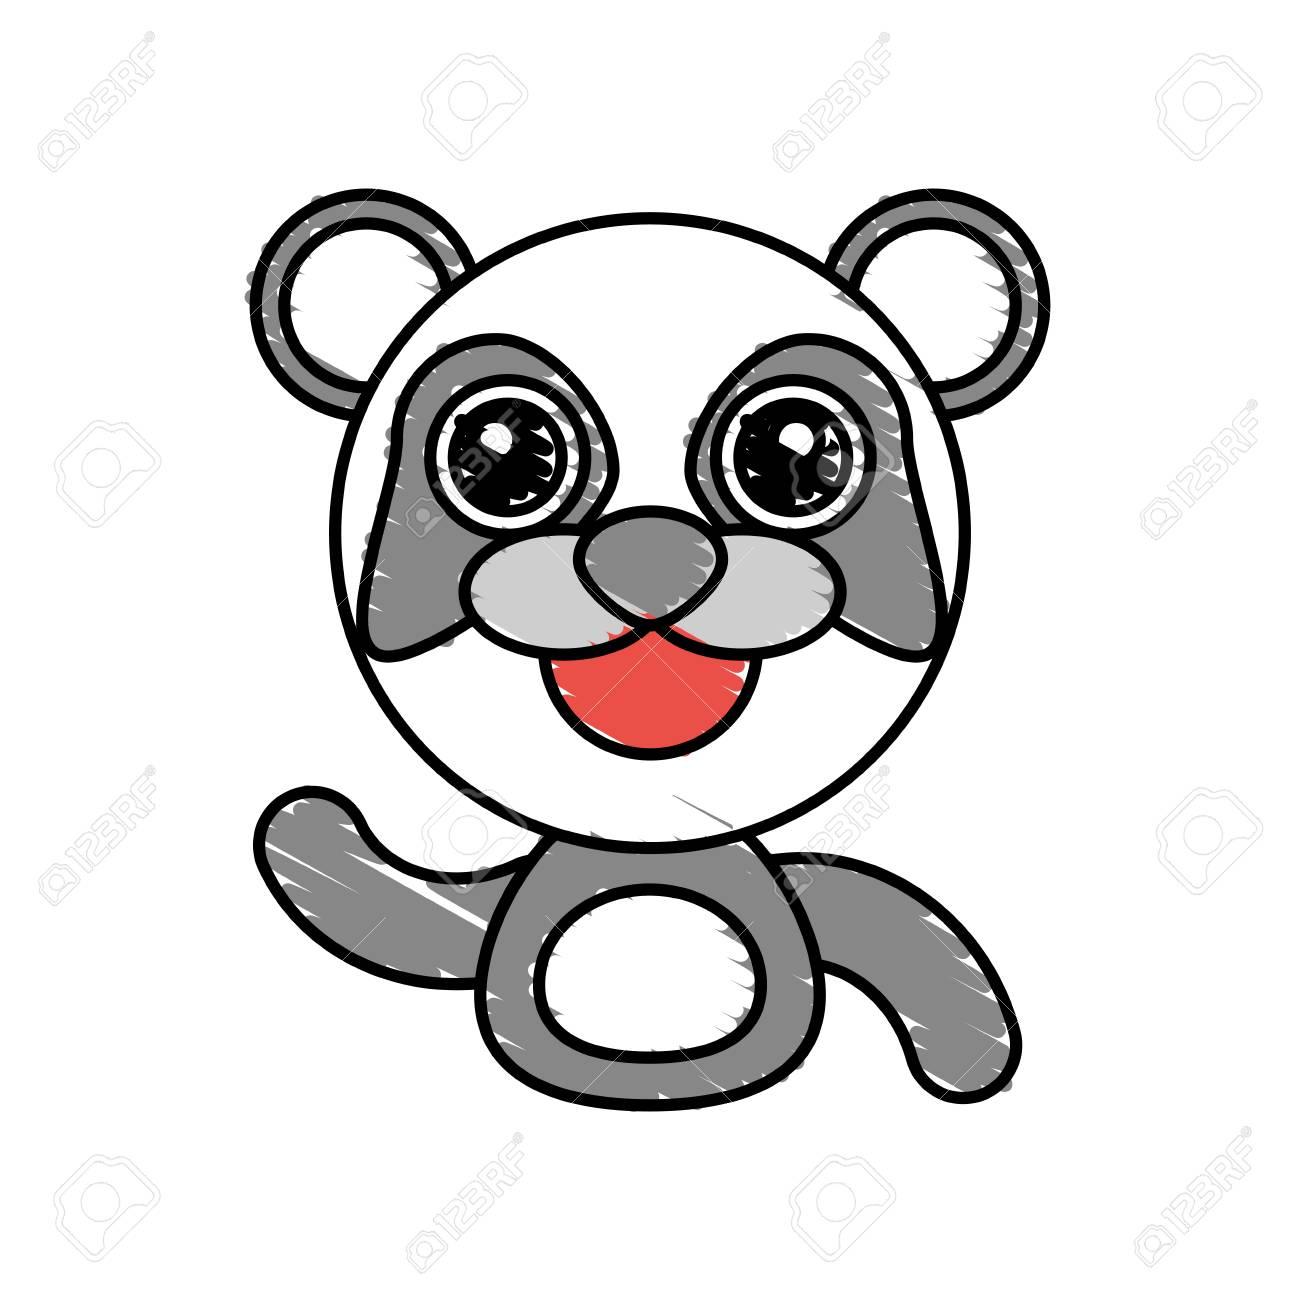 Draw Panda Animal Comic Vector Illustration Eps 10